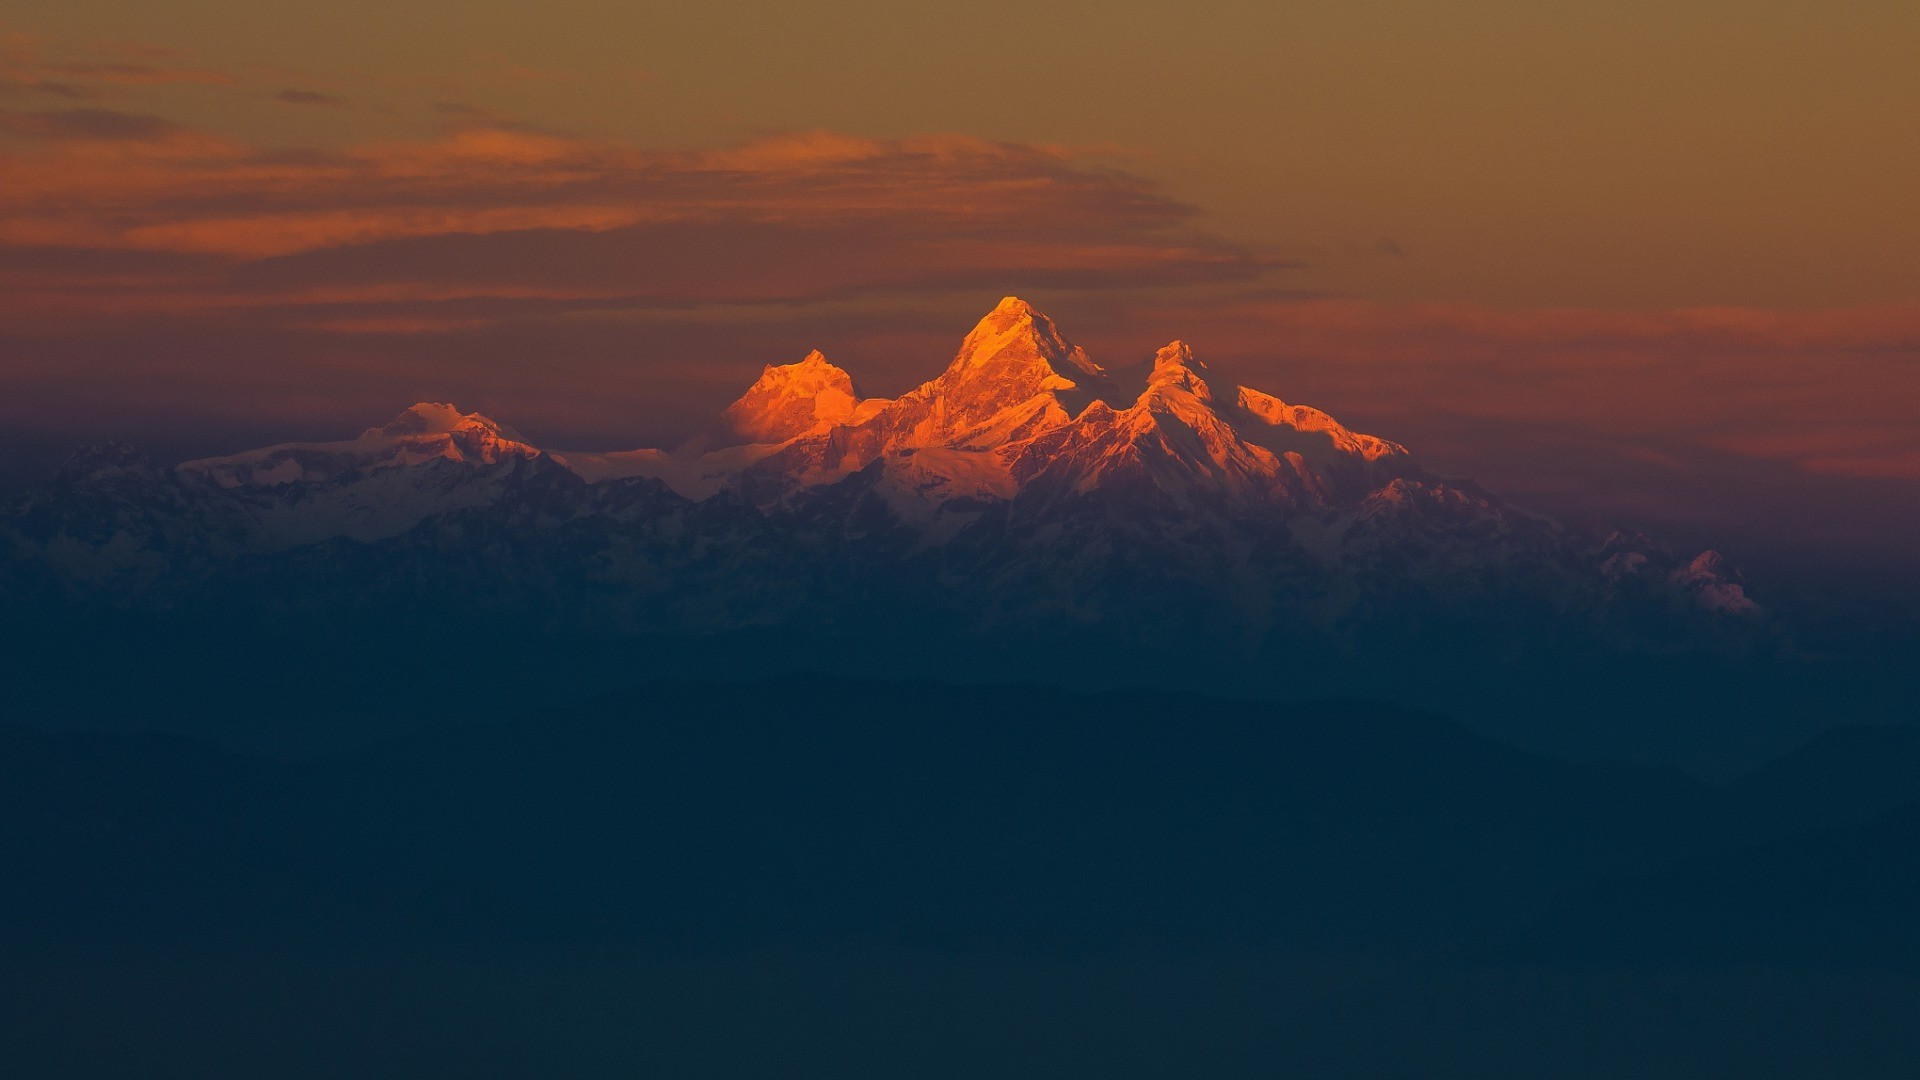 minimalist nature wallpaper,sky,mountainous landforms,mountain,mountain range,cloud